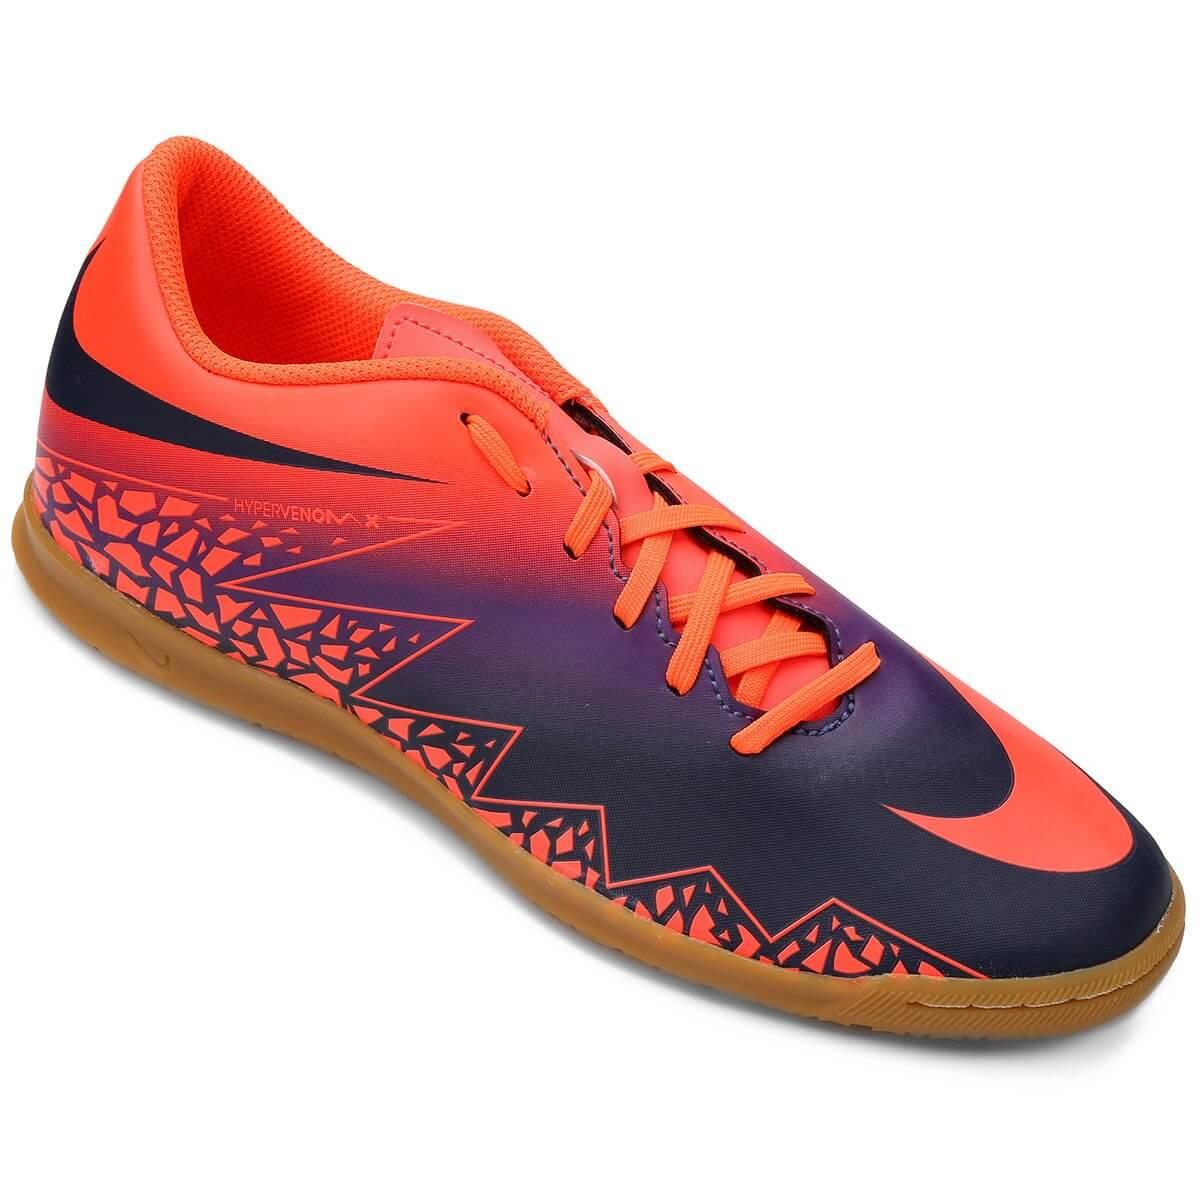 69f2d70cf9 Chuteira Nike Hypervenom Phade II IC Indoor - Decker Online!